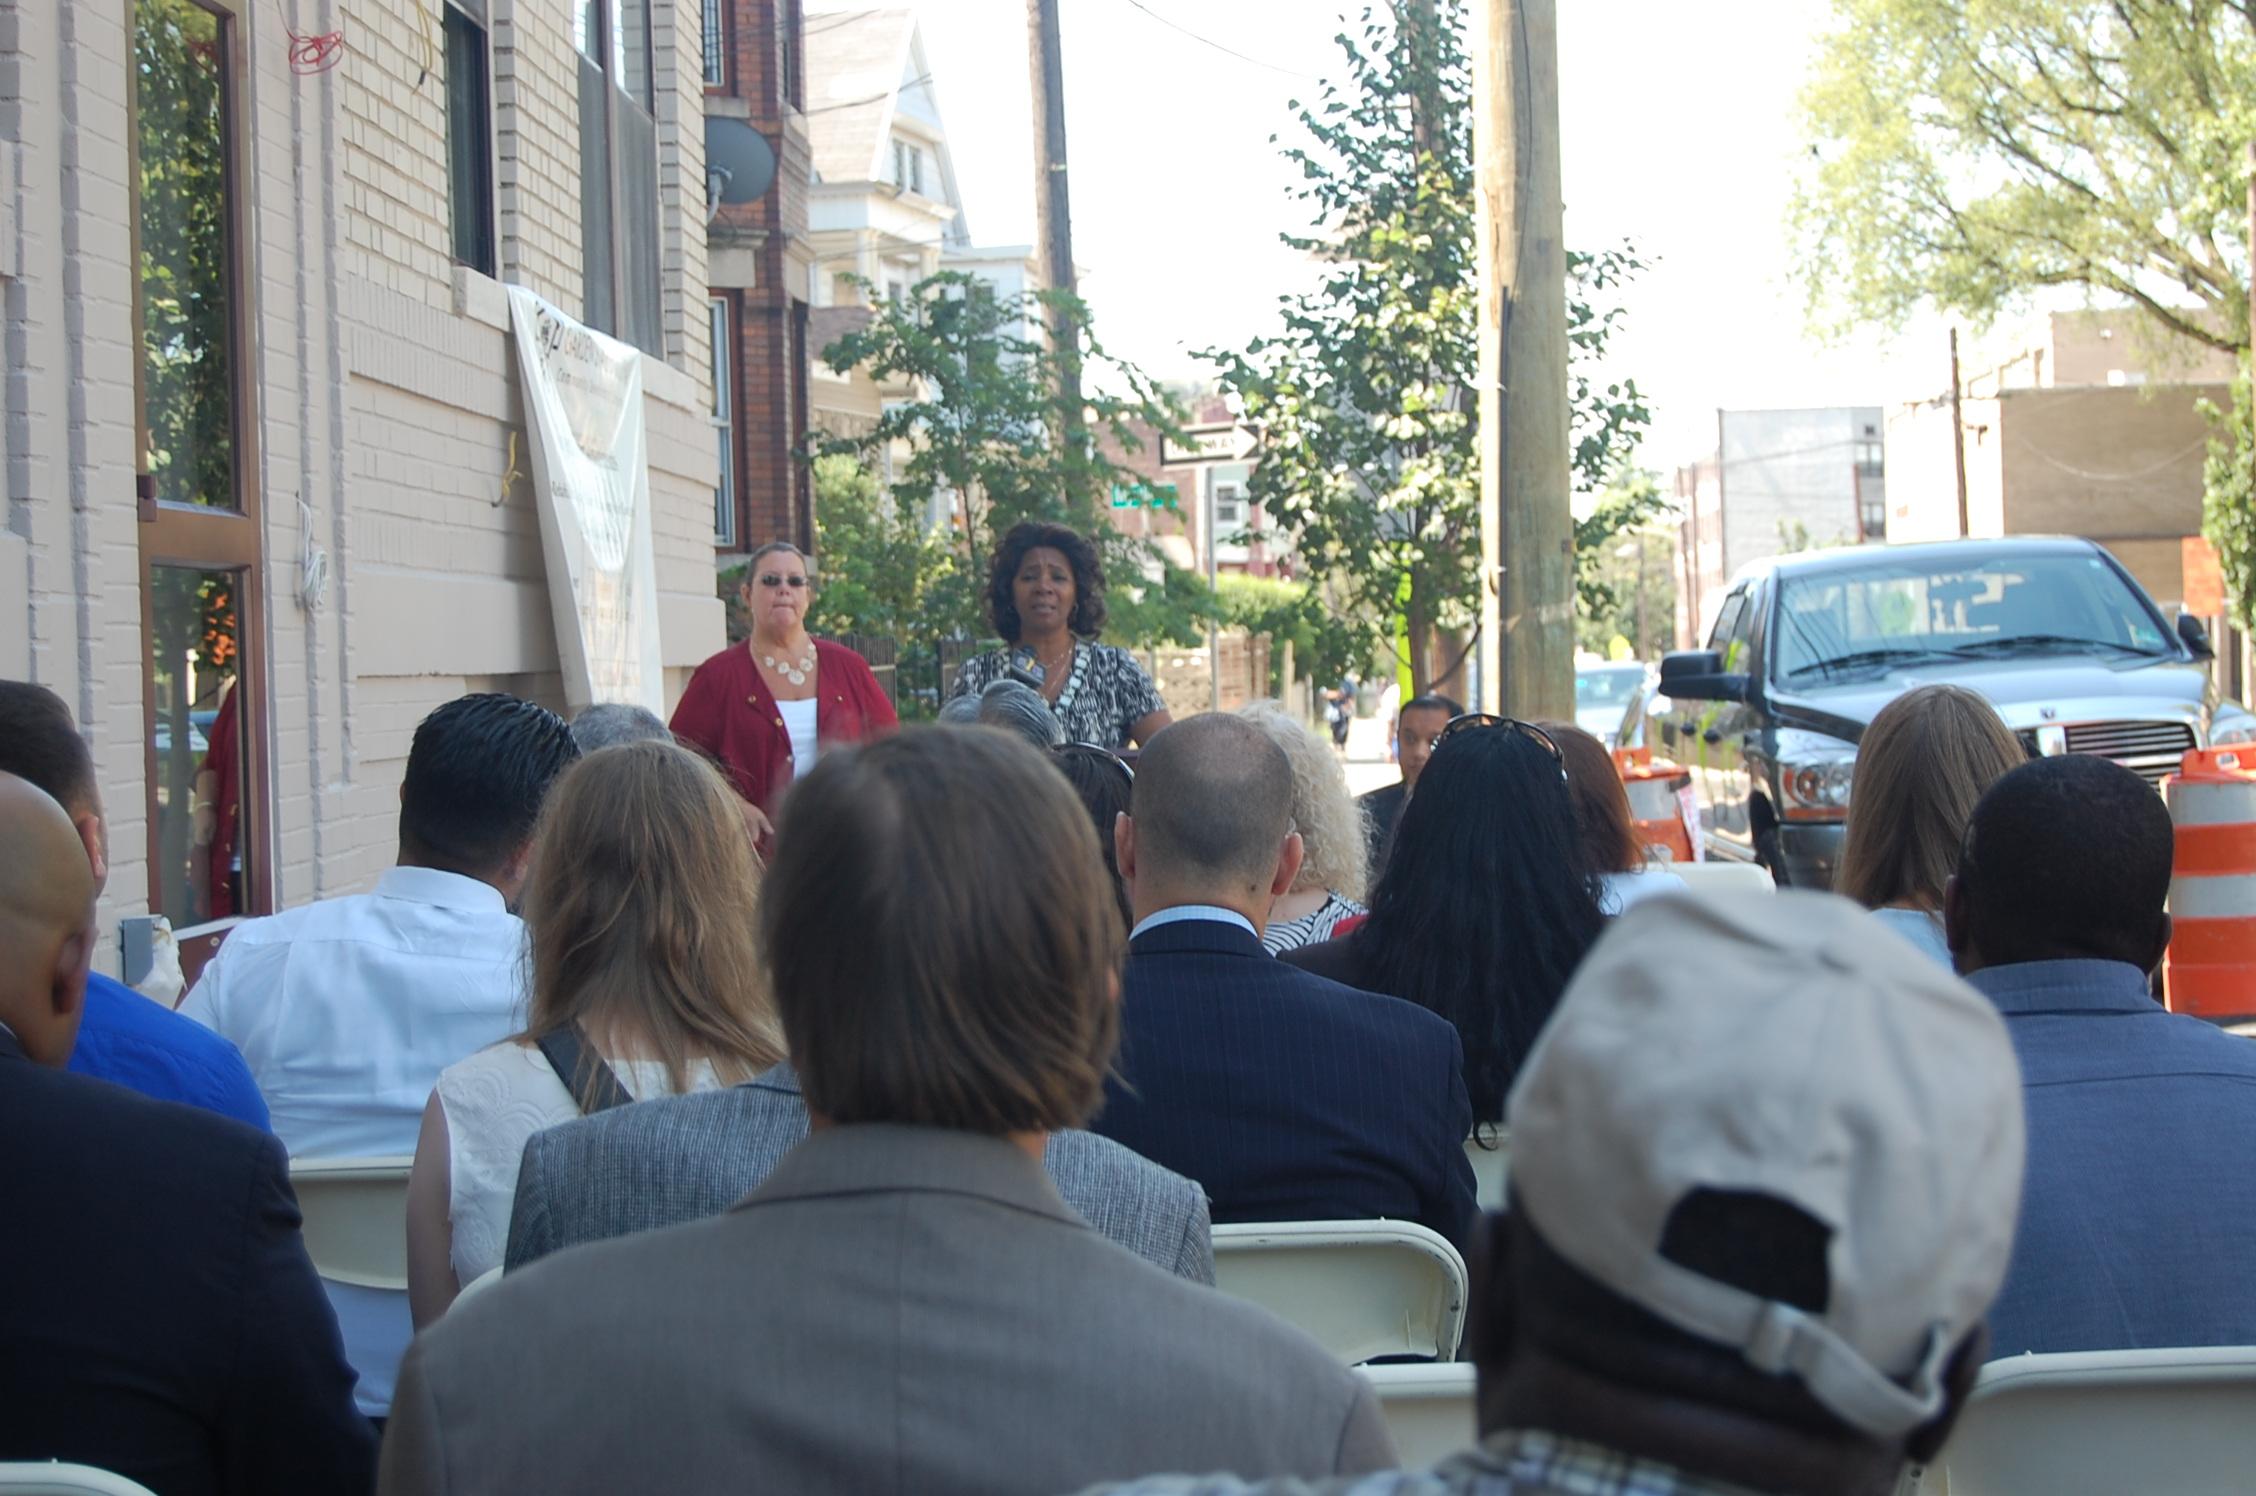 Ward F Councilwoman Coleman speaking